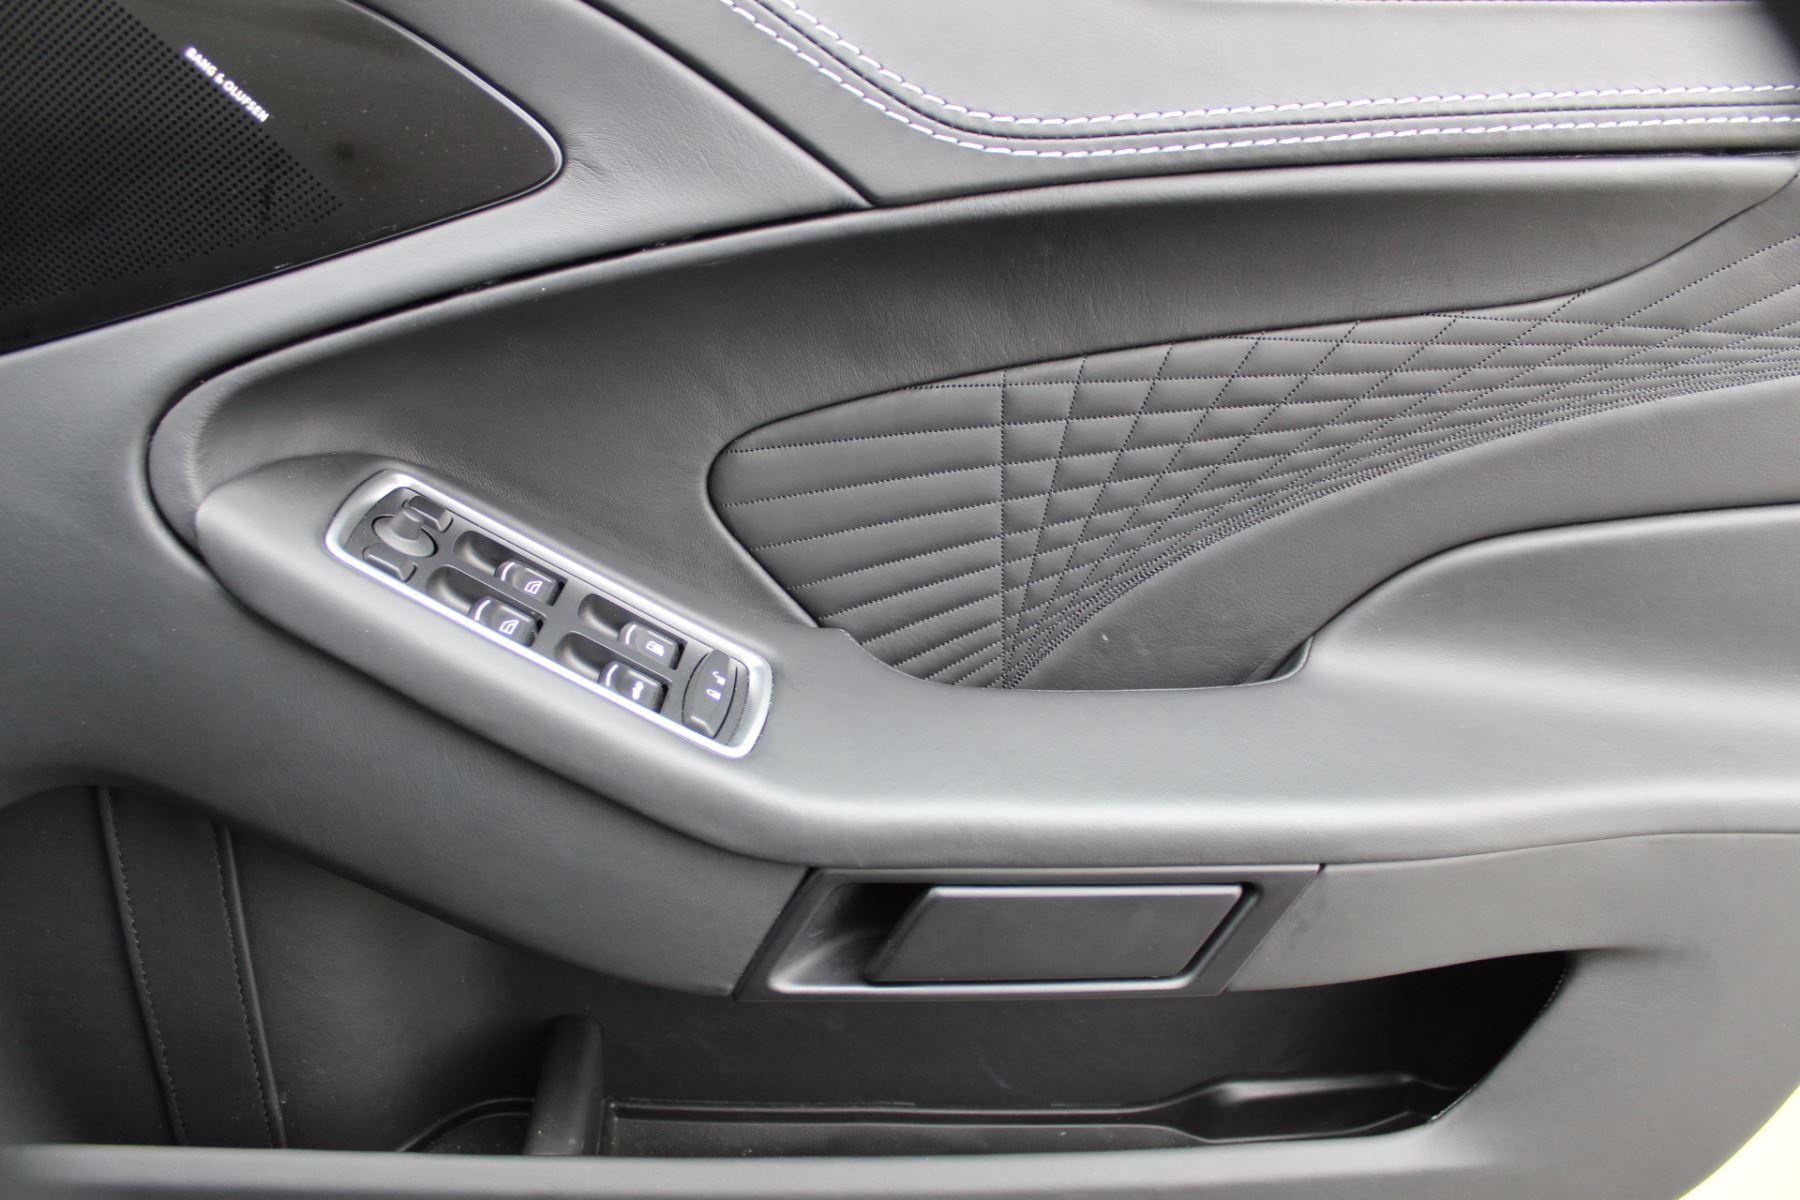 Aston Martin Vanquish S Volante V12 [595] S 2dr Volante Touchtronic image 19